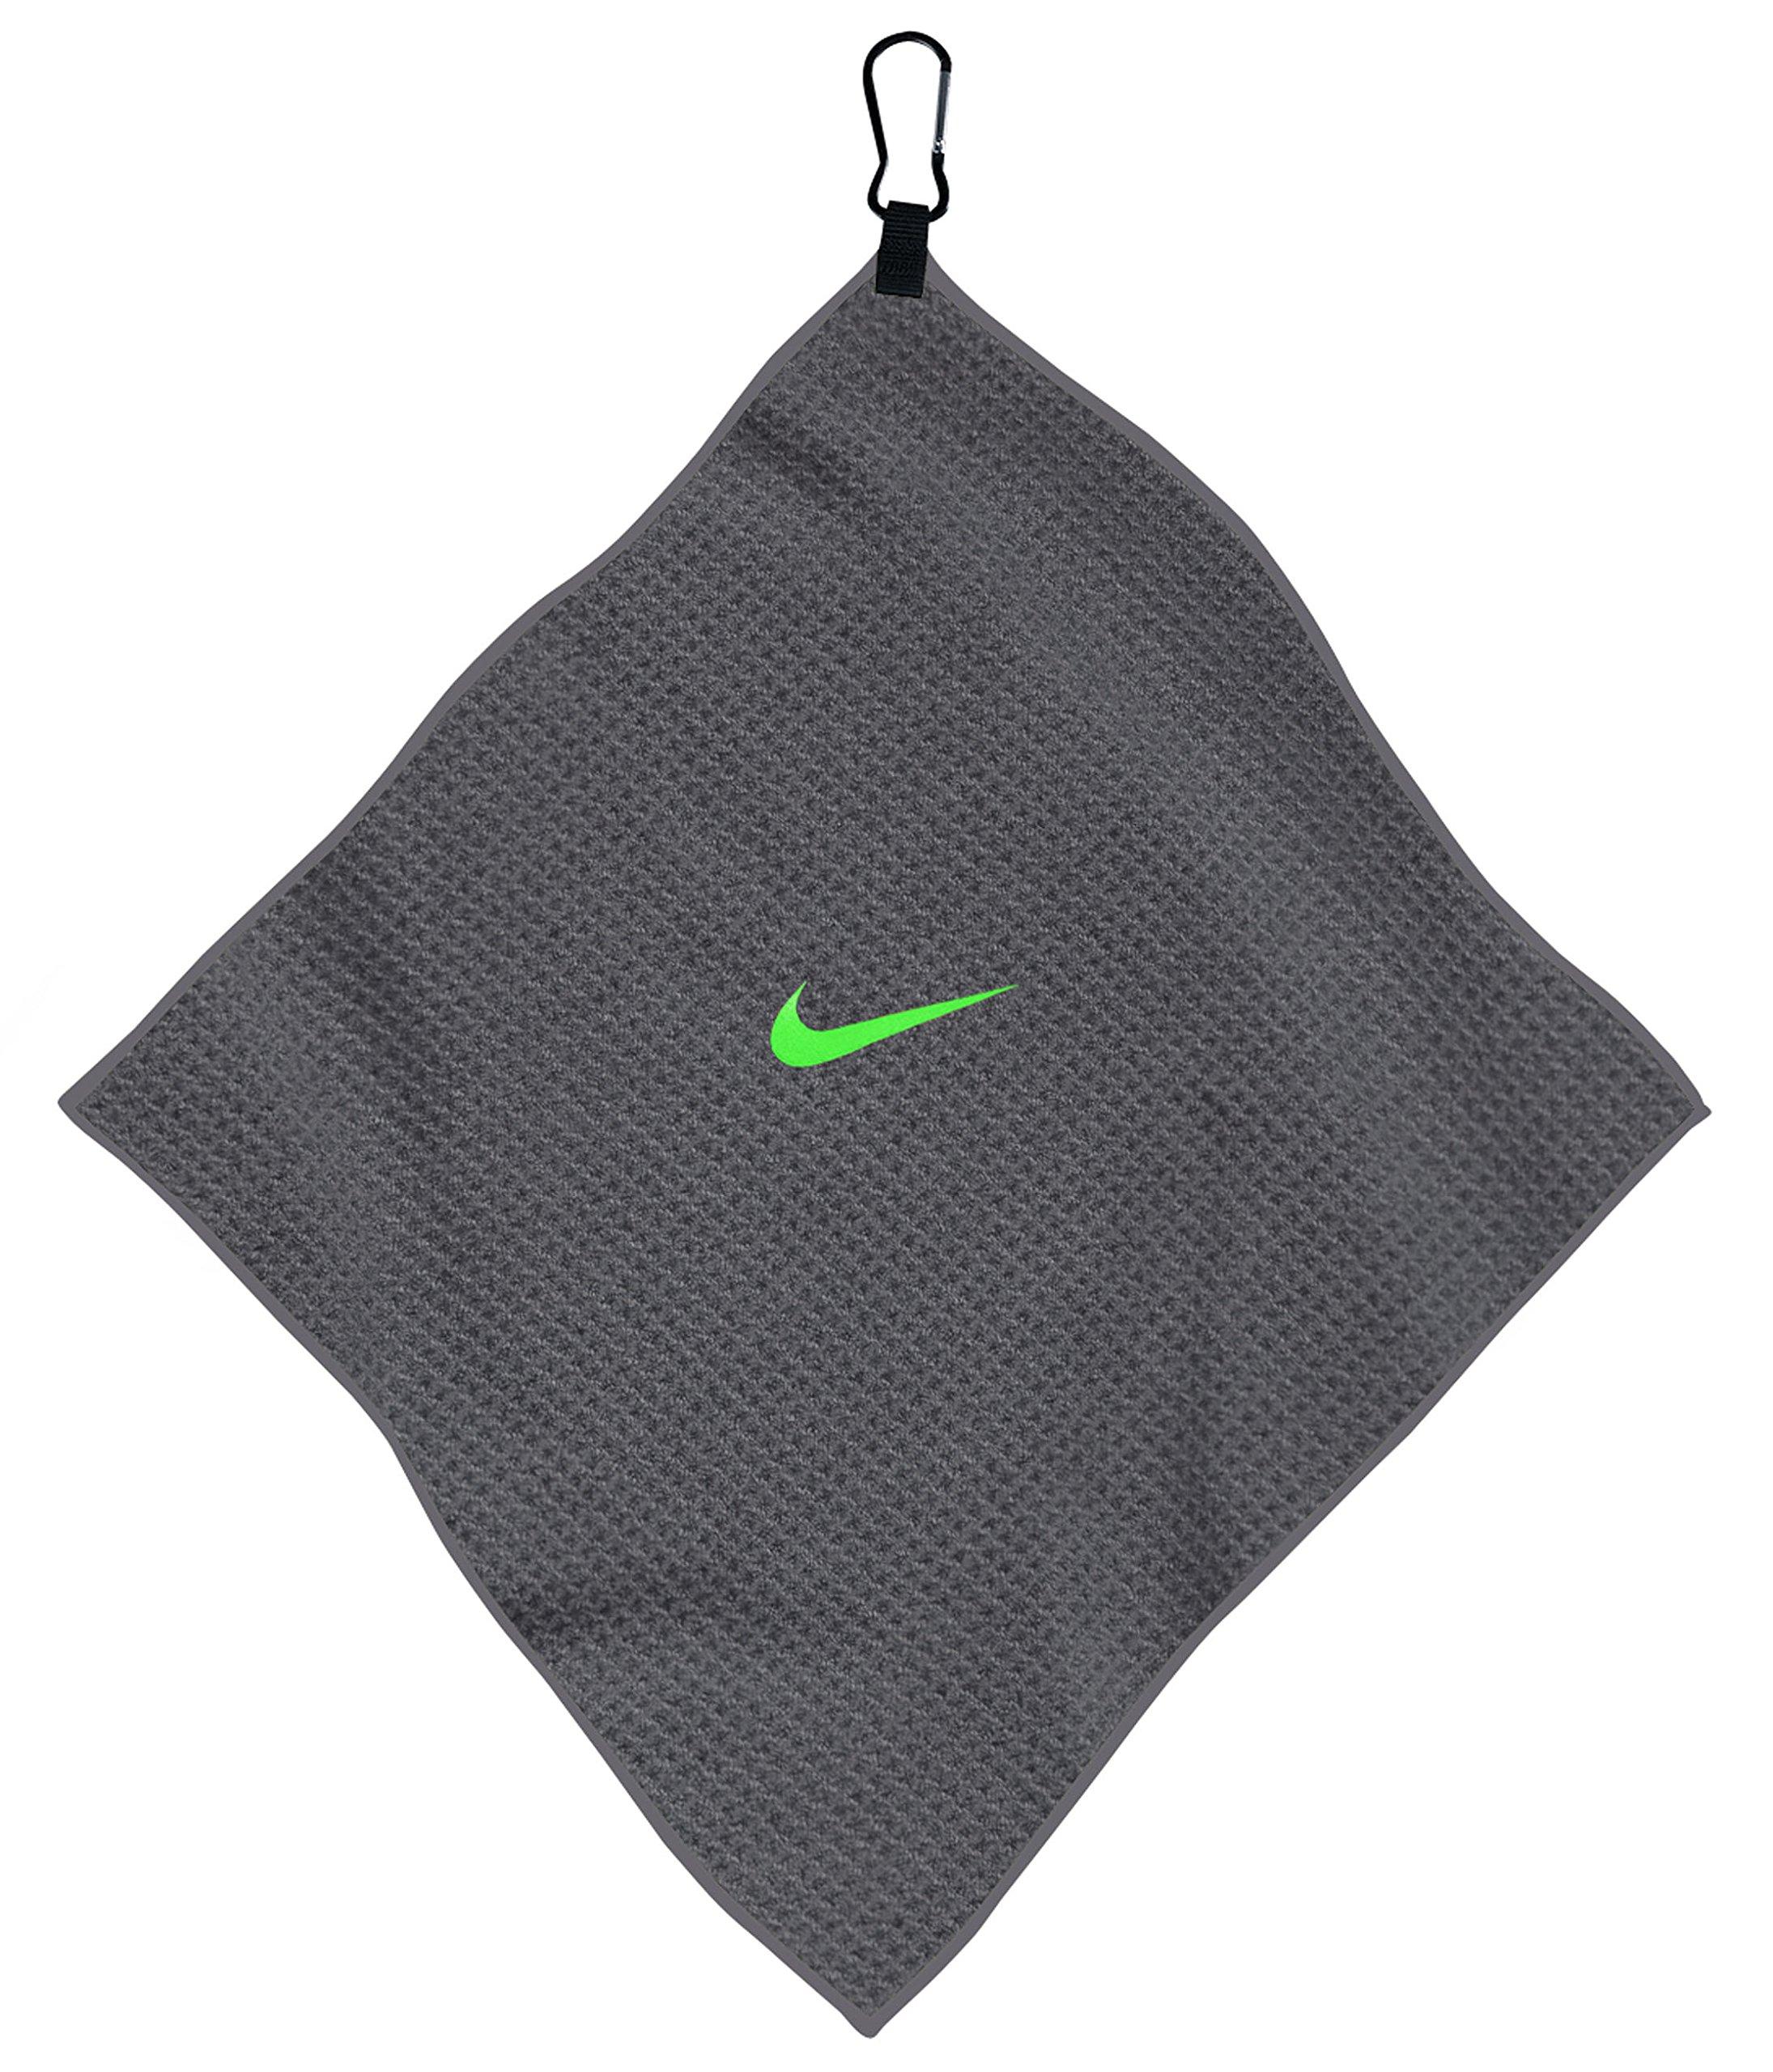 Nike 14 x 14 Microfiber Towel (Grey/Voltage Green)